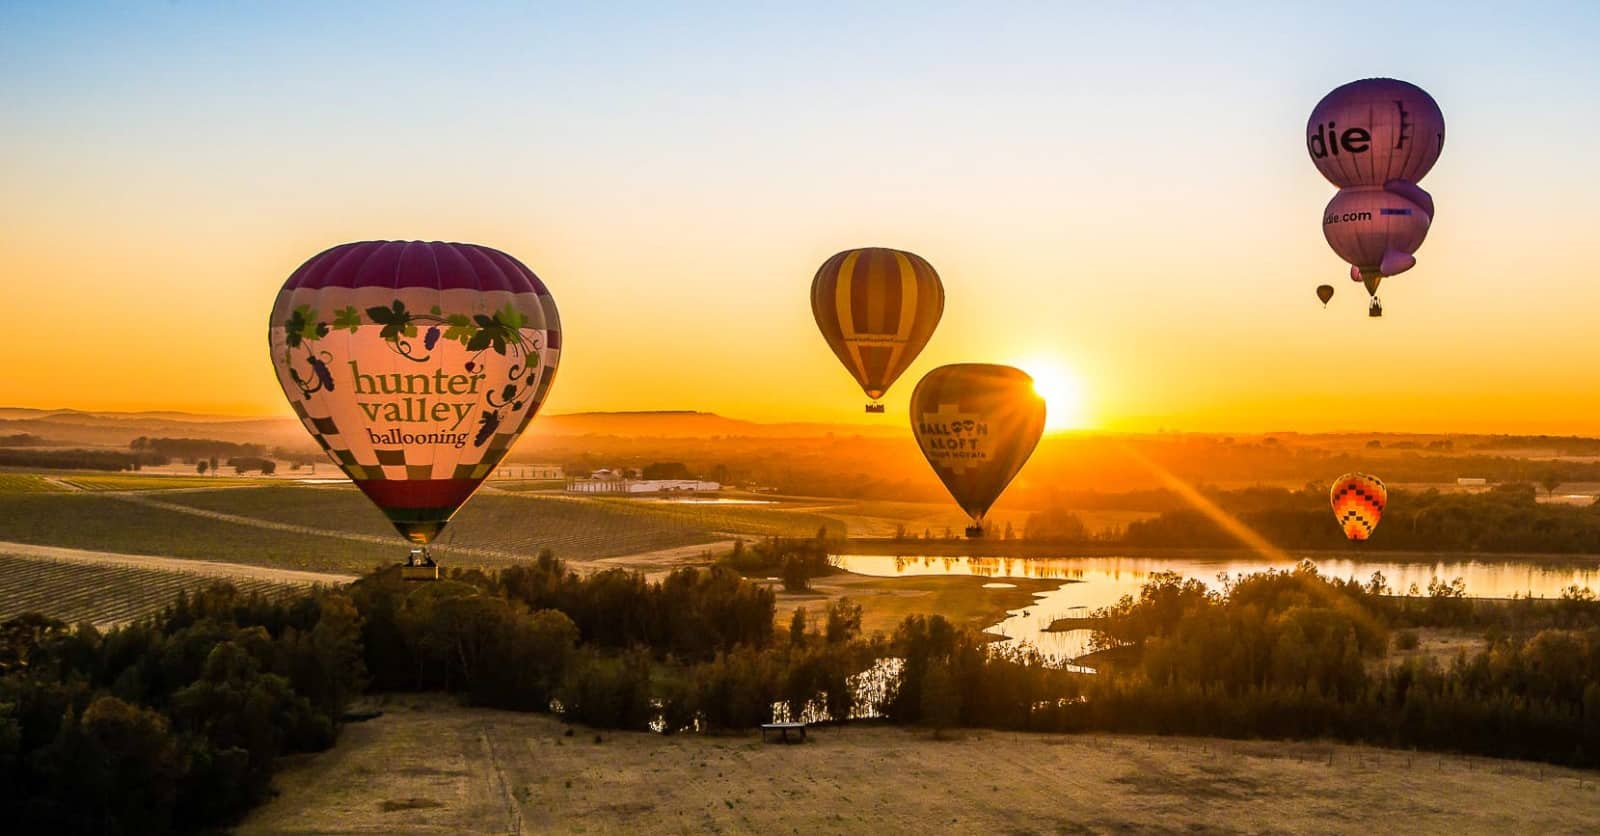 Hunter Valley Balloon Ride